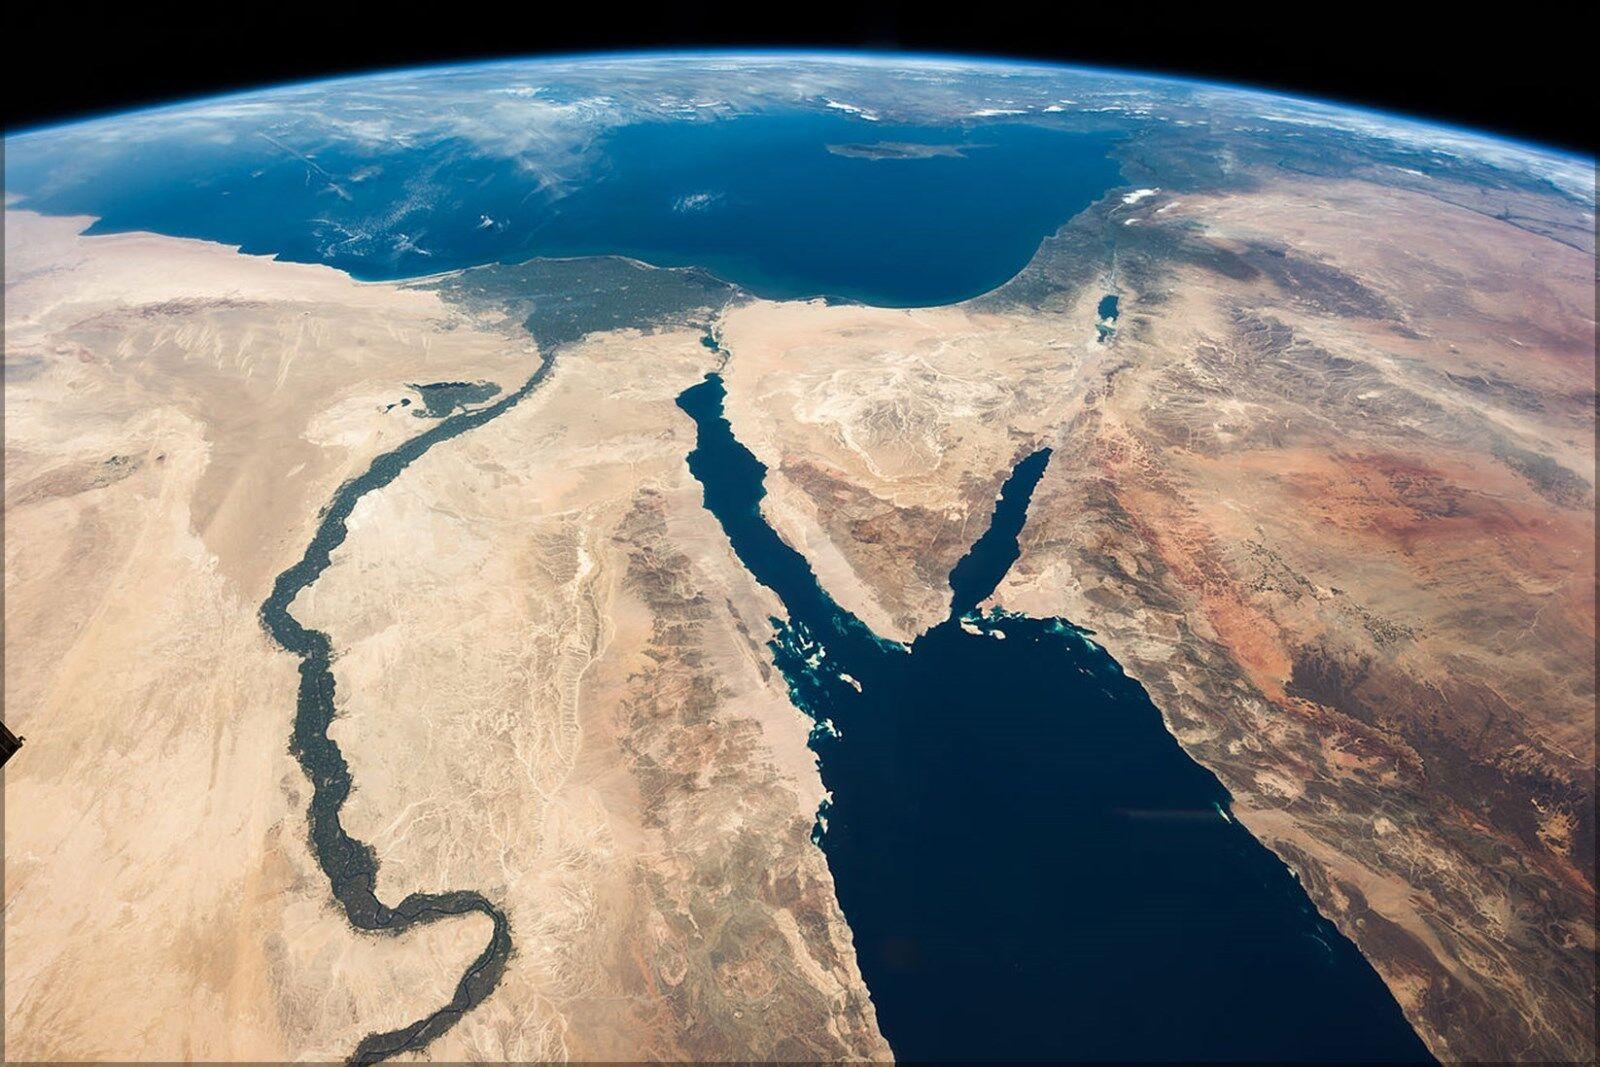 Poster, Molte Sinai Misure; Nile Fiume Egitto Sinai Molte Peninsula Israele Satellitare cc1b93